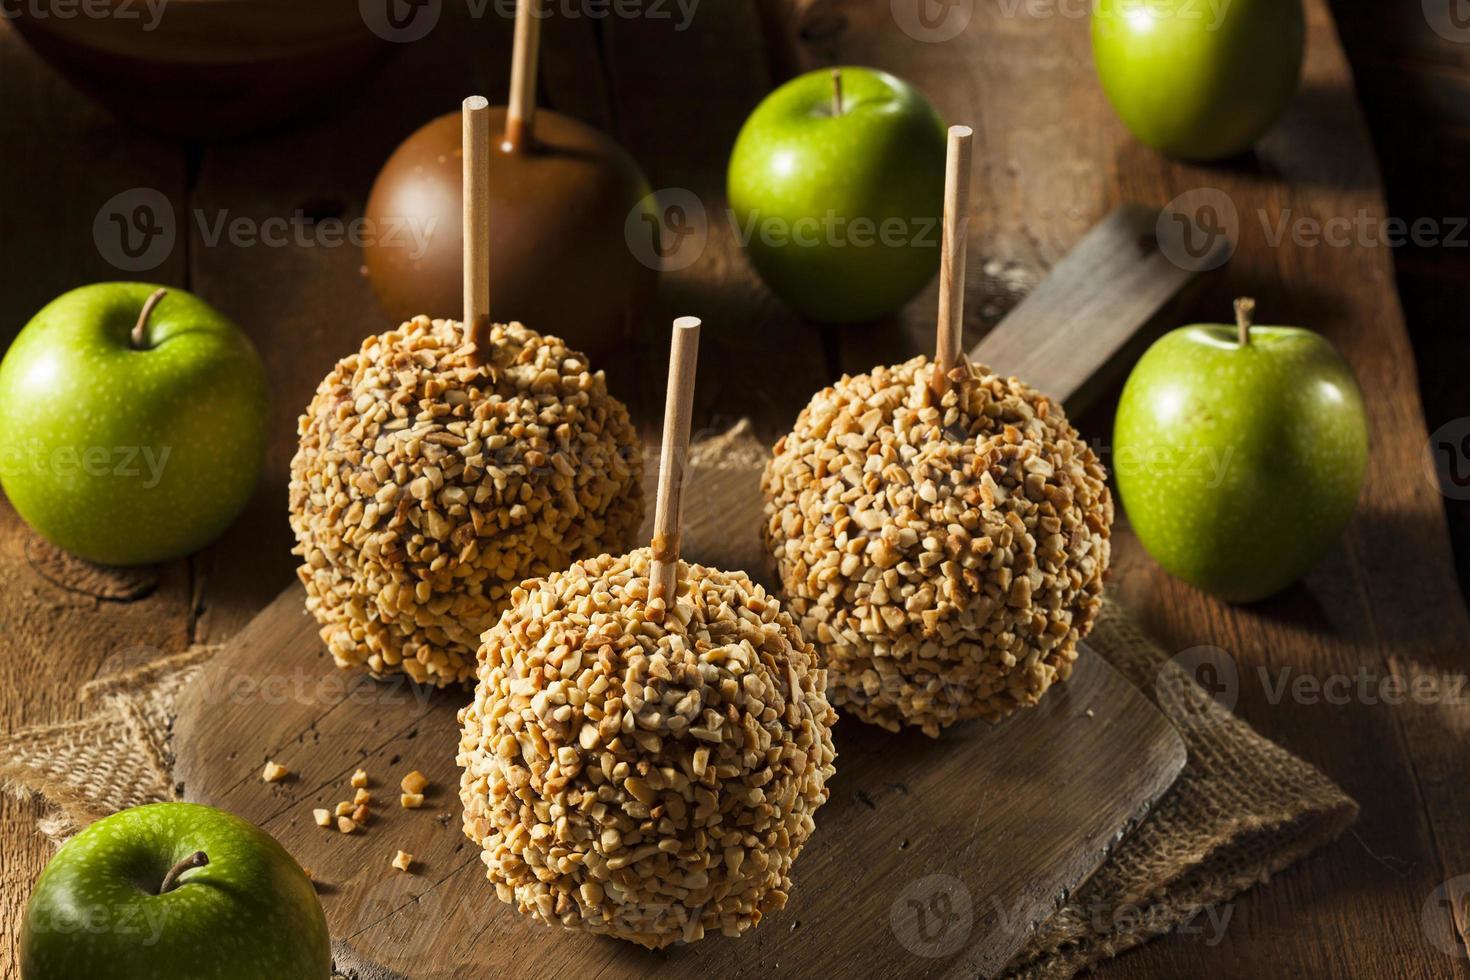 Homemade Taffy Apples with Peanuts photo